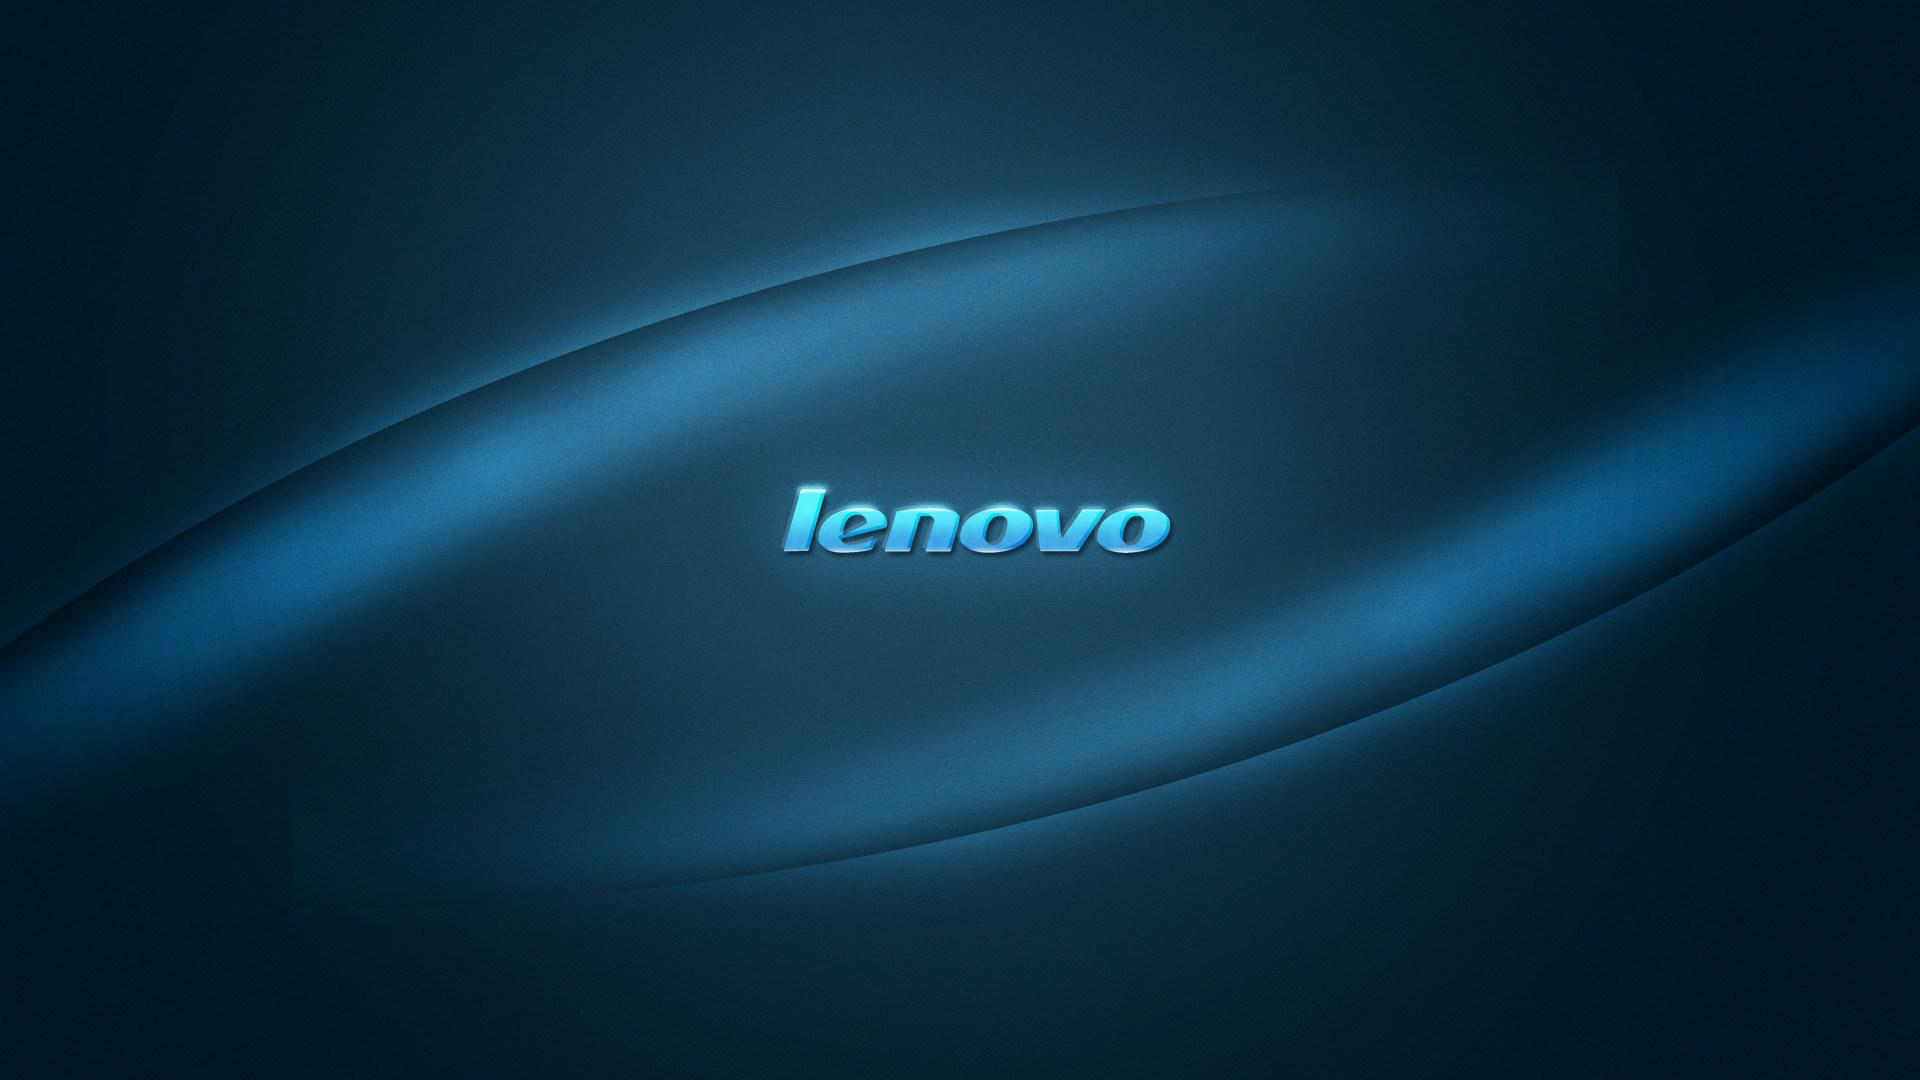 Lenovo 1920x1080 lenovo thinkpad windows 8 theme lenovo wallpaper 1920x1080